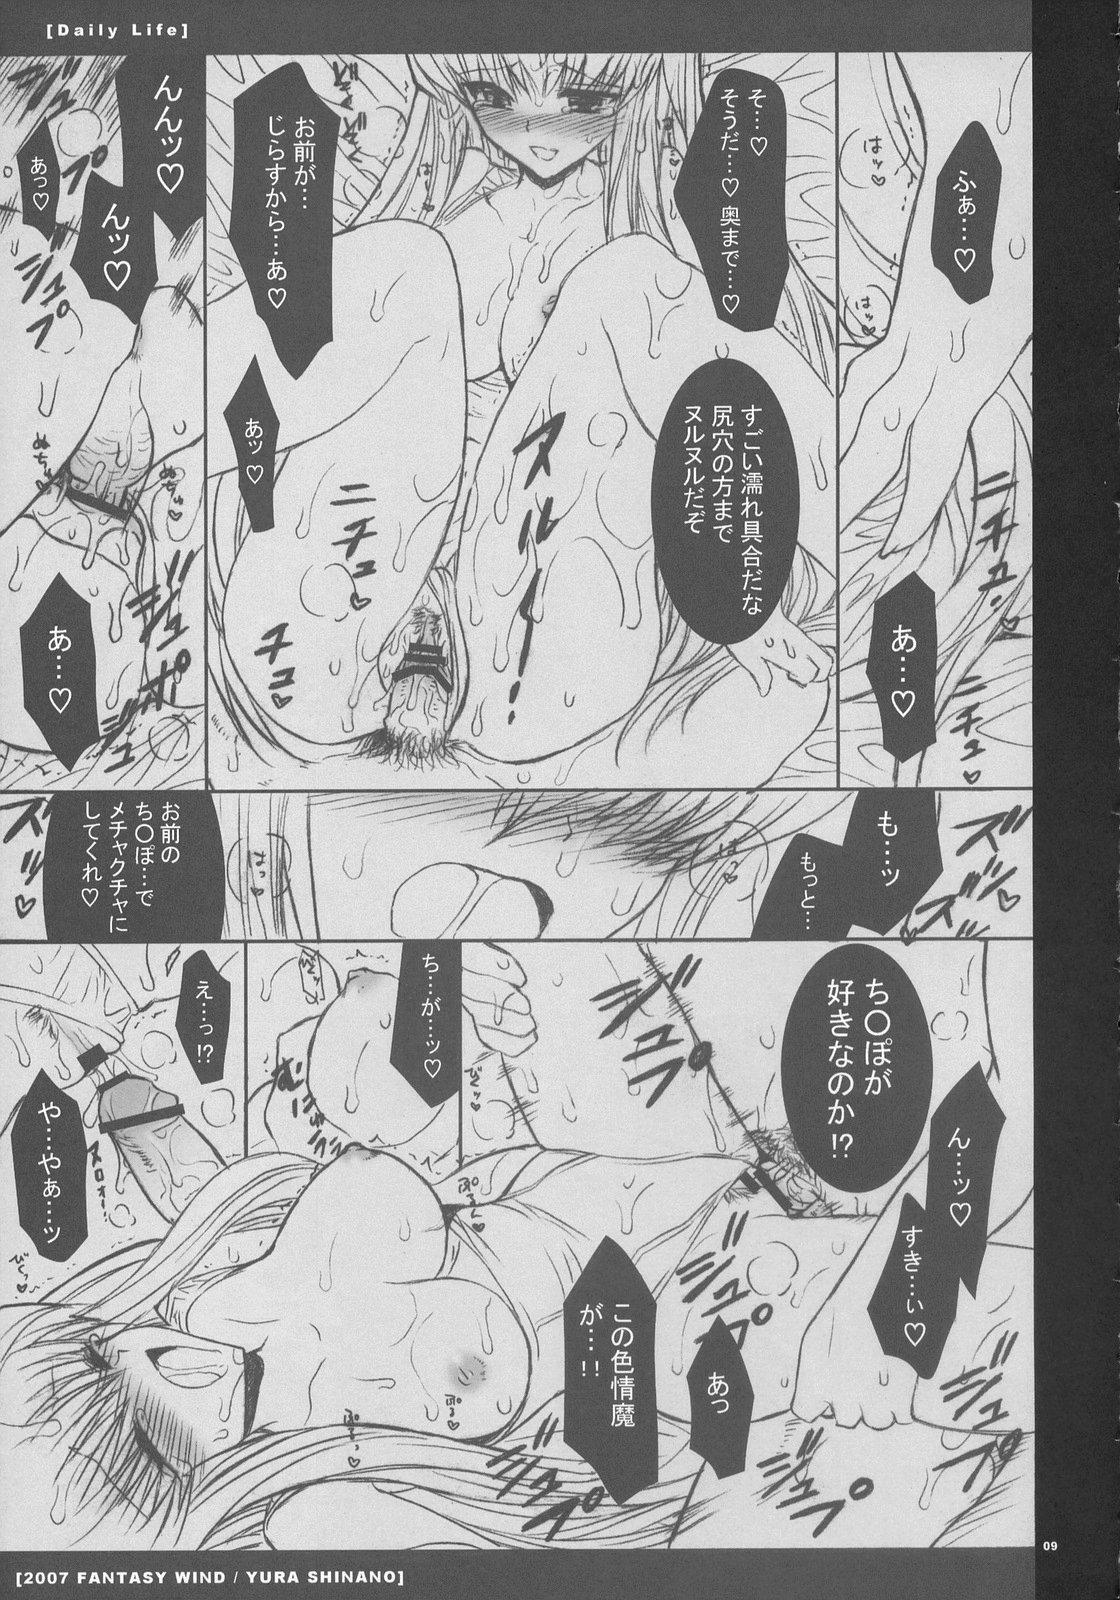 (C72) [FANTASY WIND (Shinano Yura)} Daily Life (Code Geass: Lelouch of the Rebellion) 7